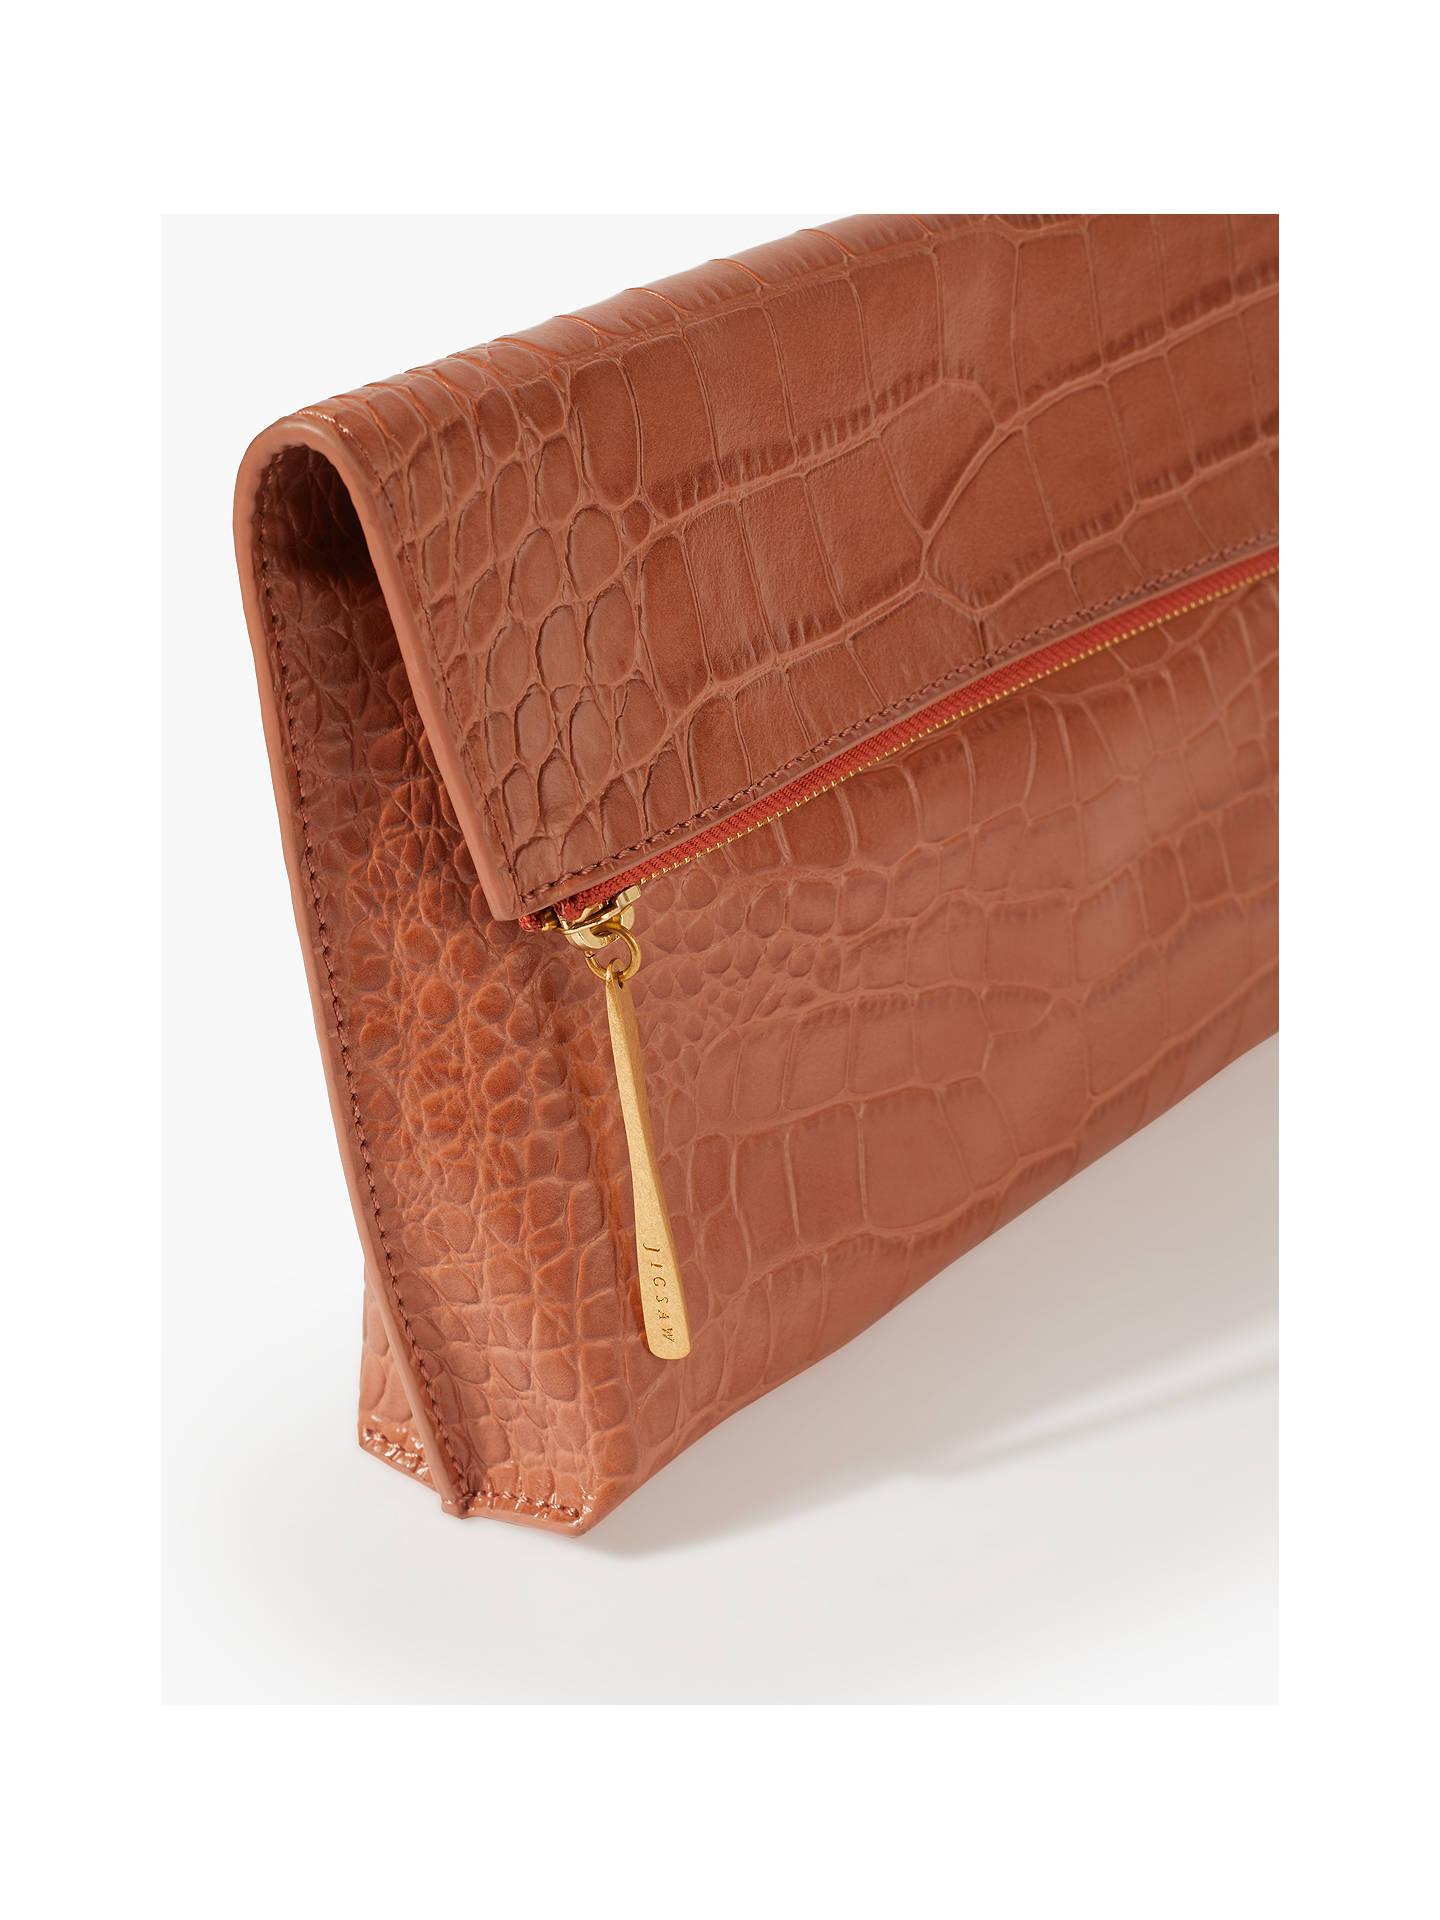 0c93d13ef ... Buy Jigsaw Eve Croc Embossed Leather Foldover Clutch Bag, Terracotta  Online at johnlewis.com